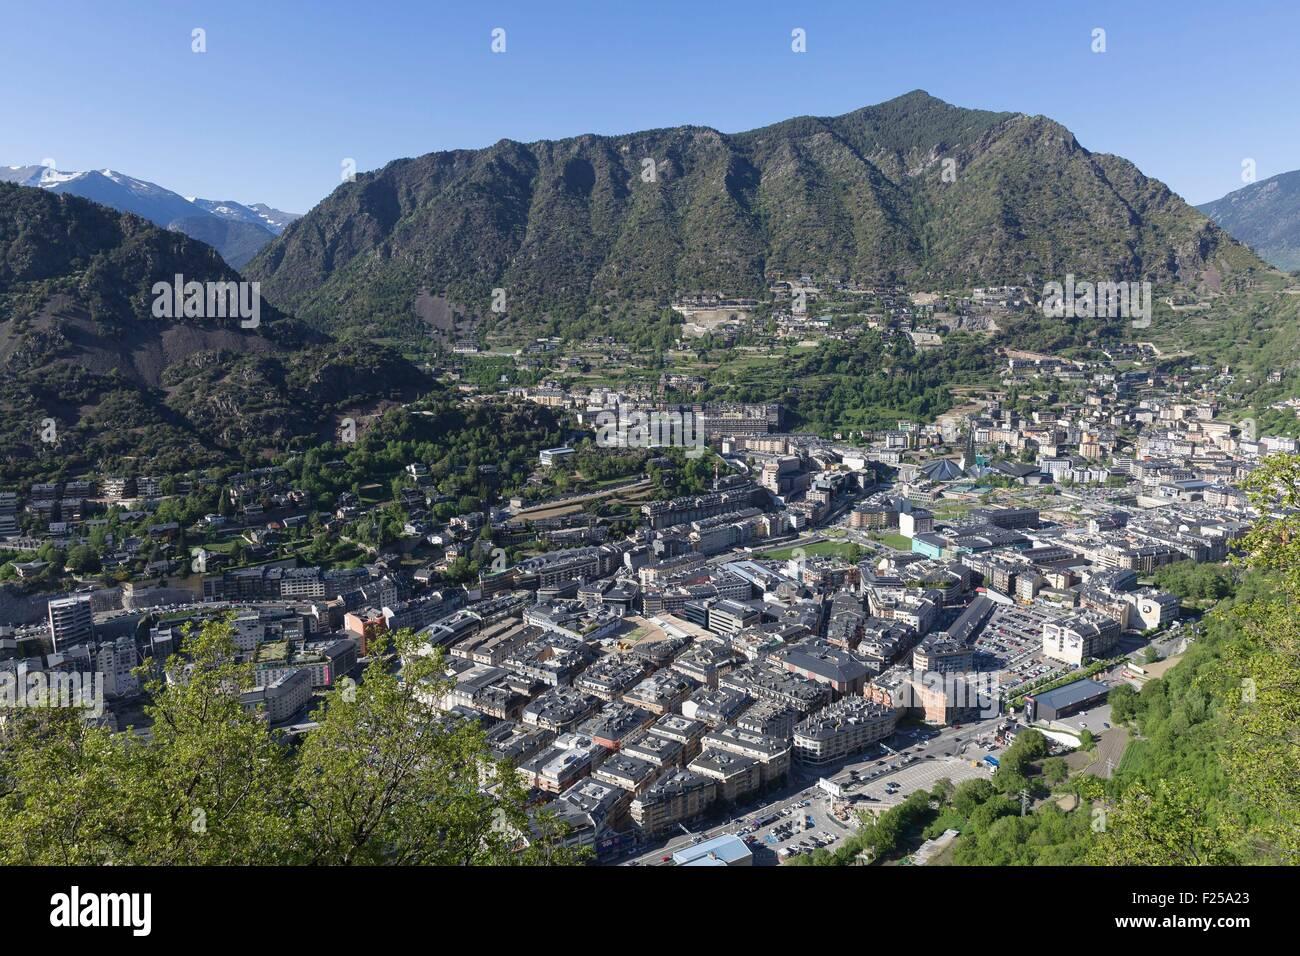 Andorra, Andorra La Vella, capital city of Andorra state, Escaldes-Engordany - Stock Image